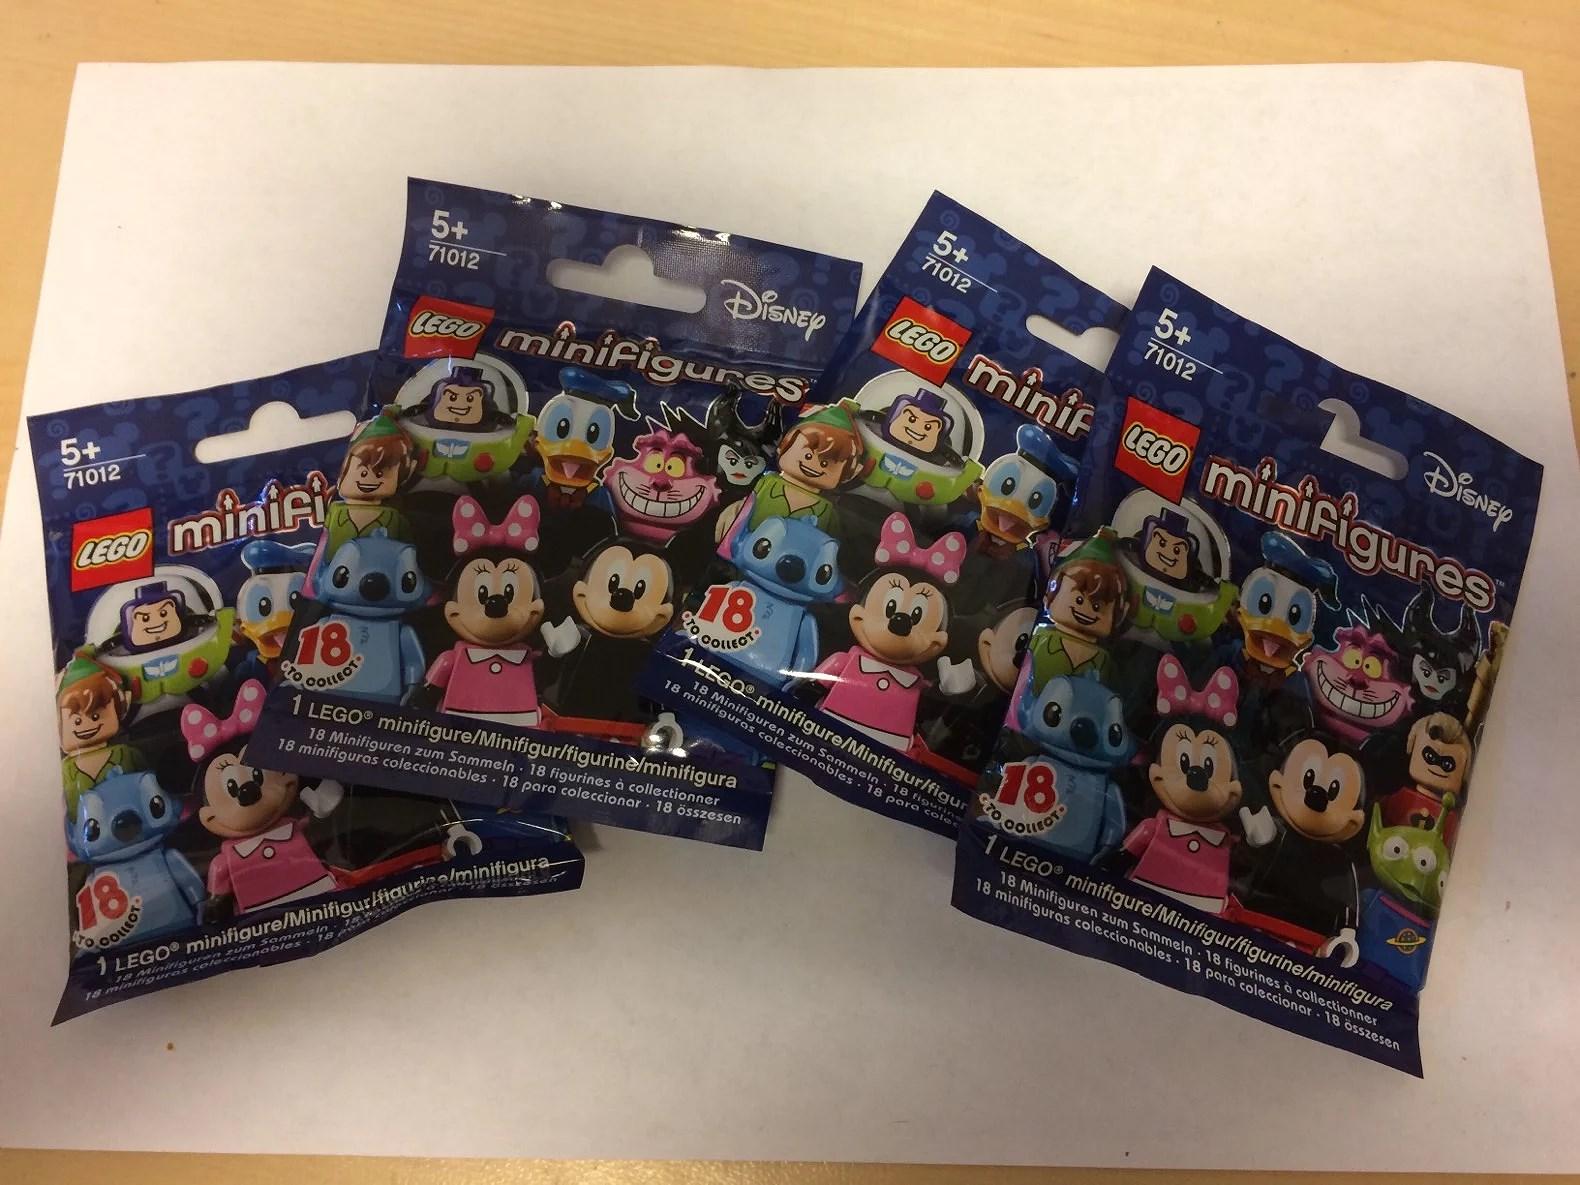 Nya Disney Lego minifigurer